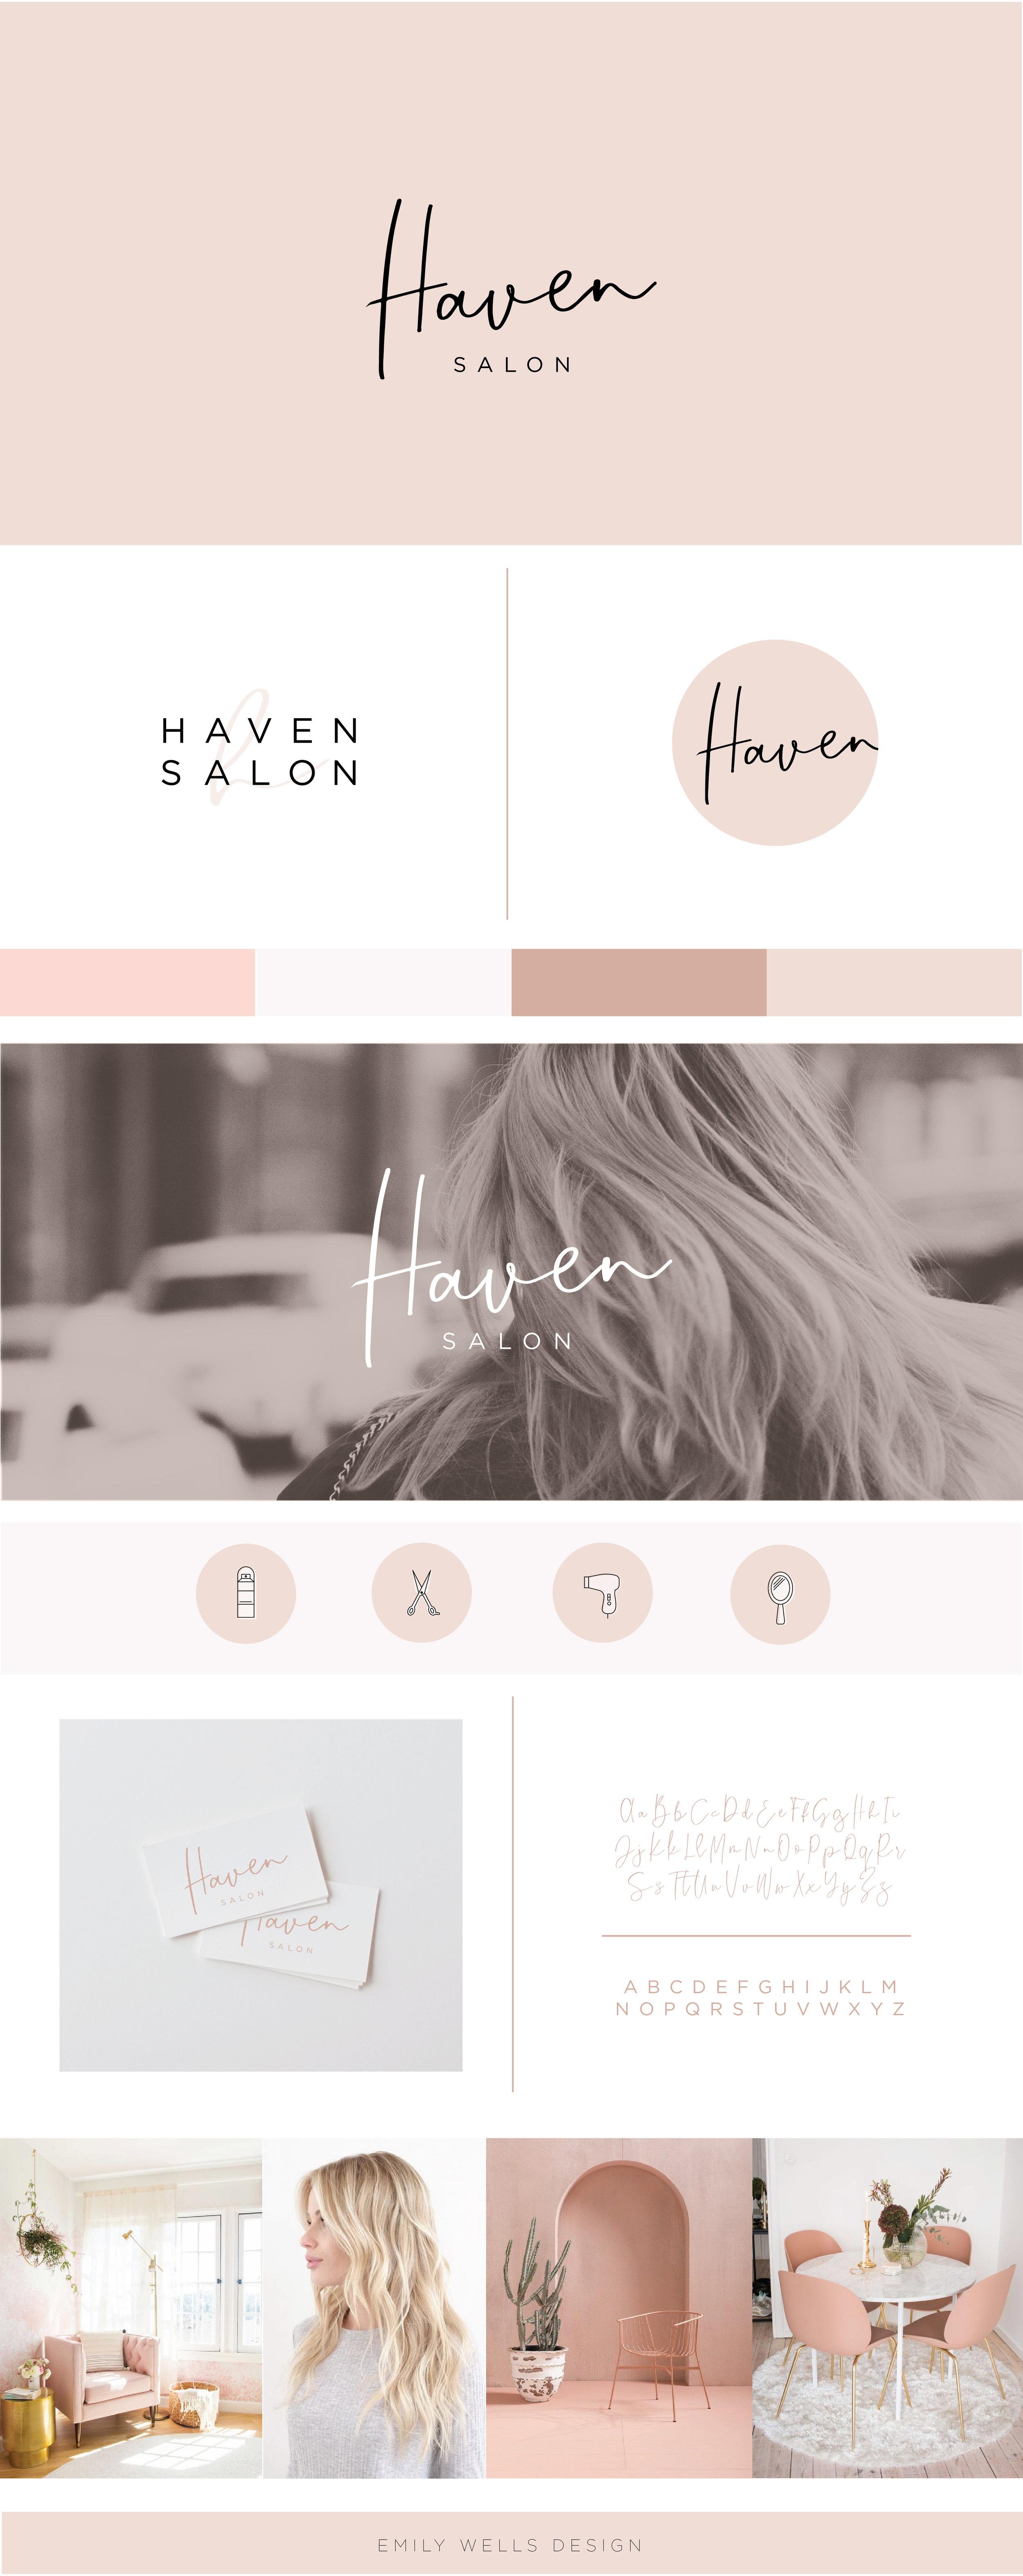 Haven-Salon-Brand Board-01.jpg